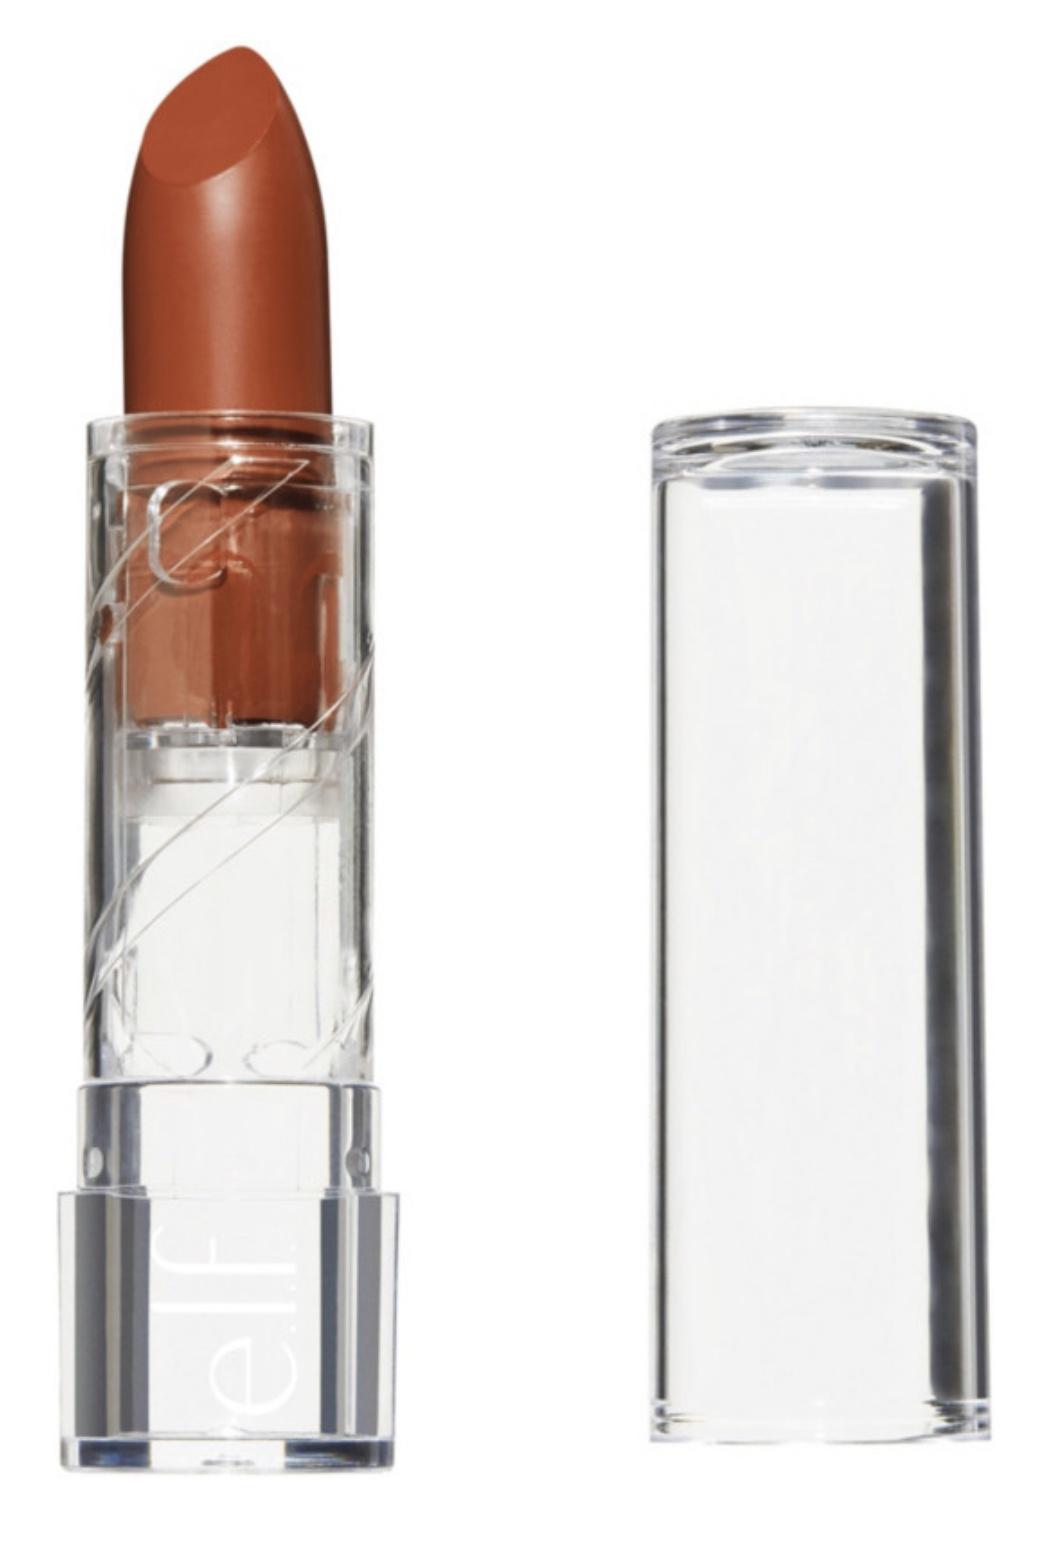 e.l.f. Srsly Satin Lipstick (Cider)